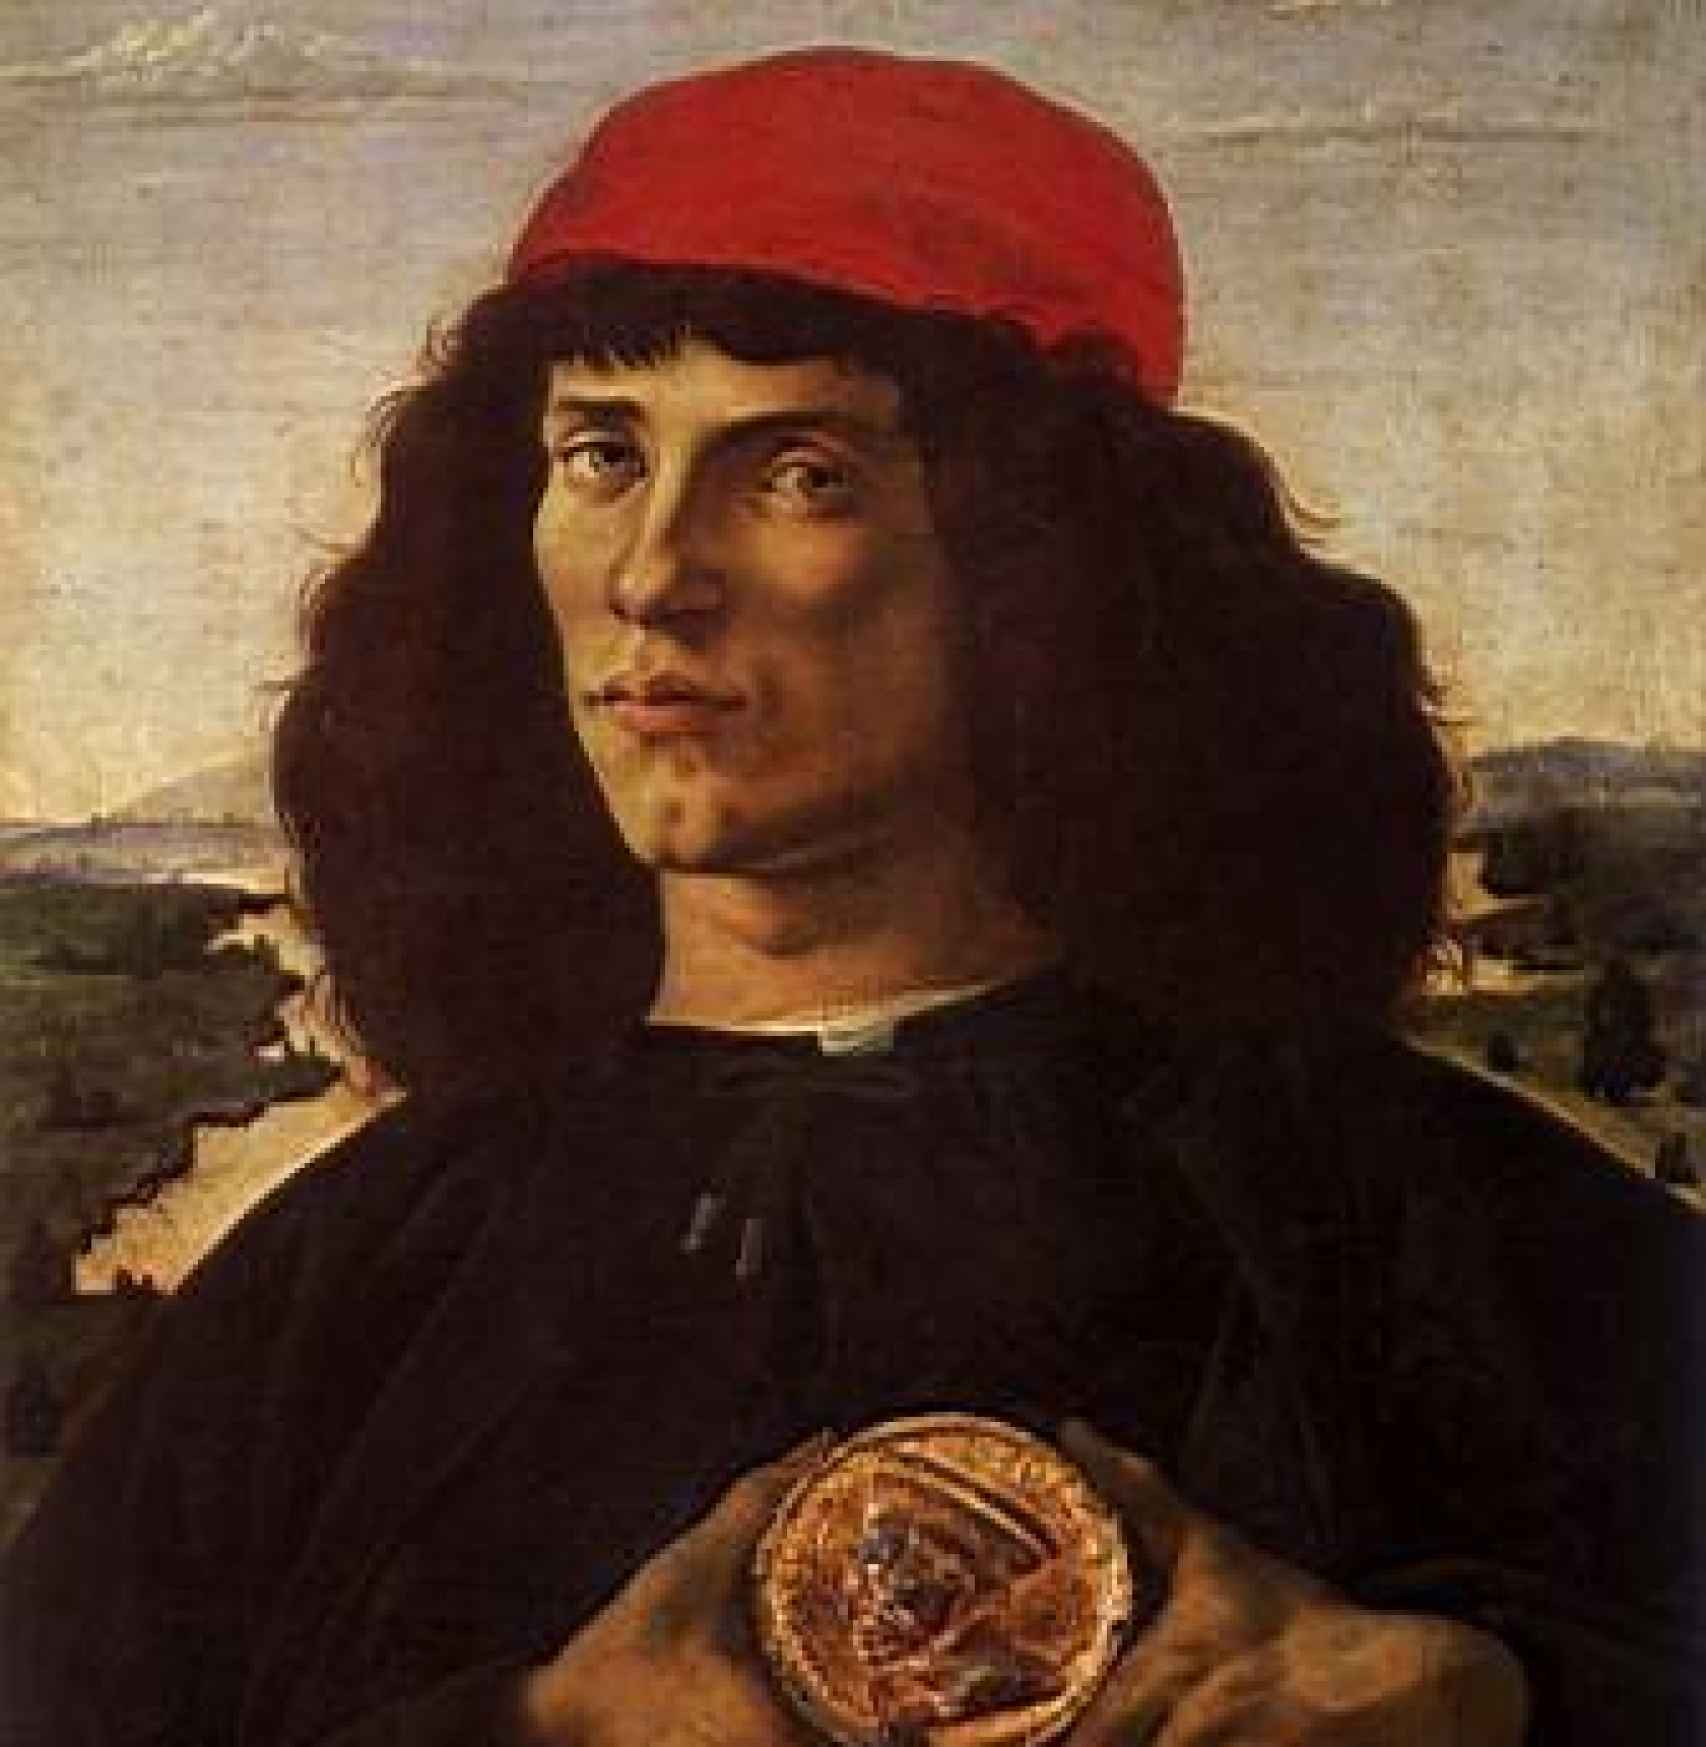 Retrato de Pico della Mirandola.